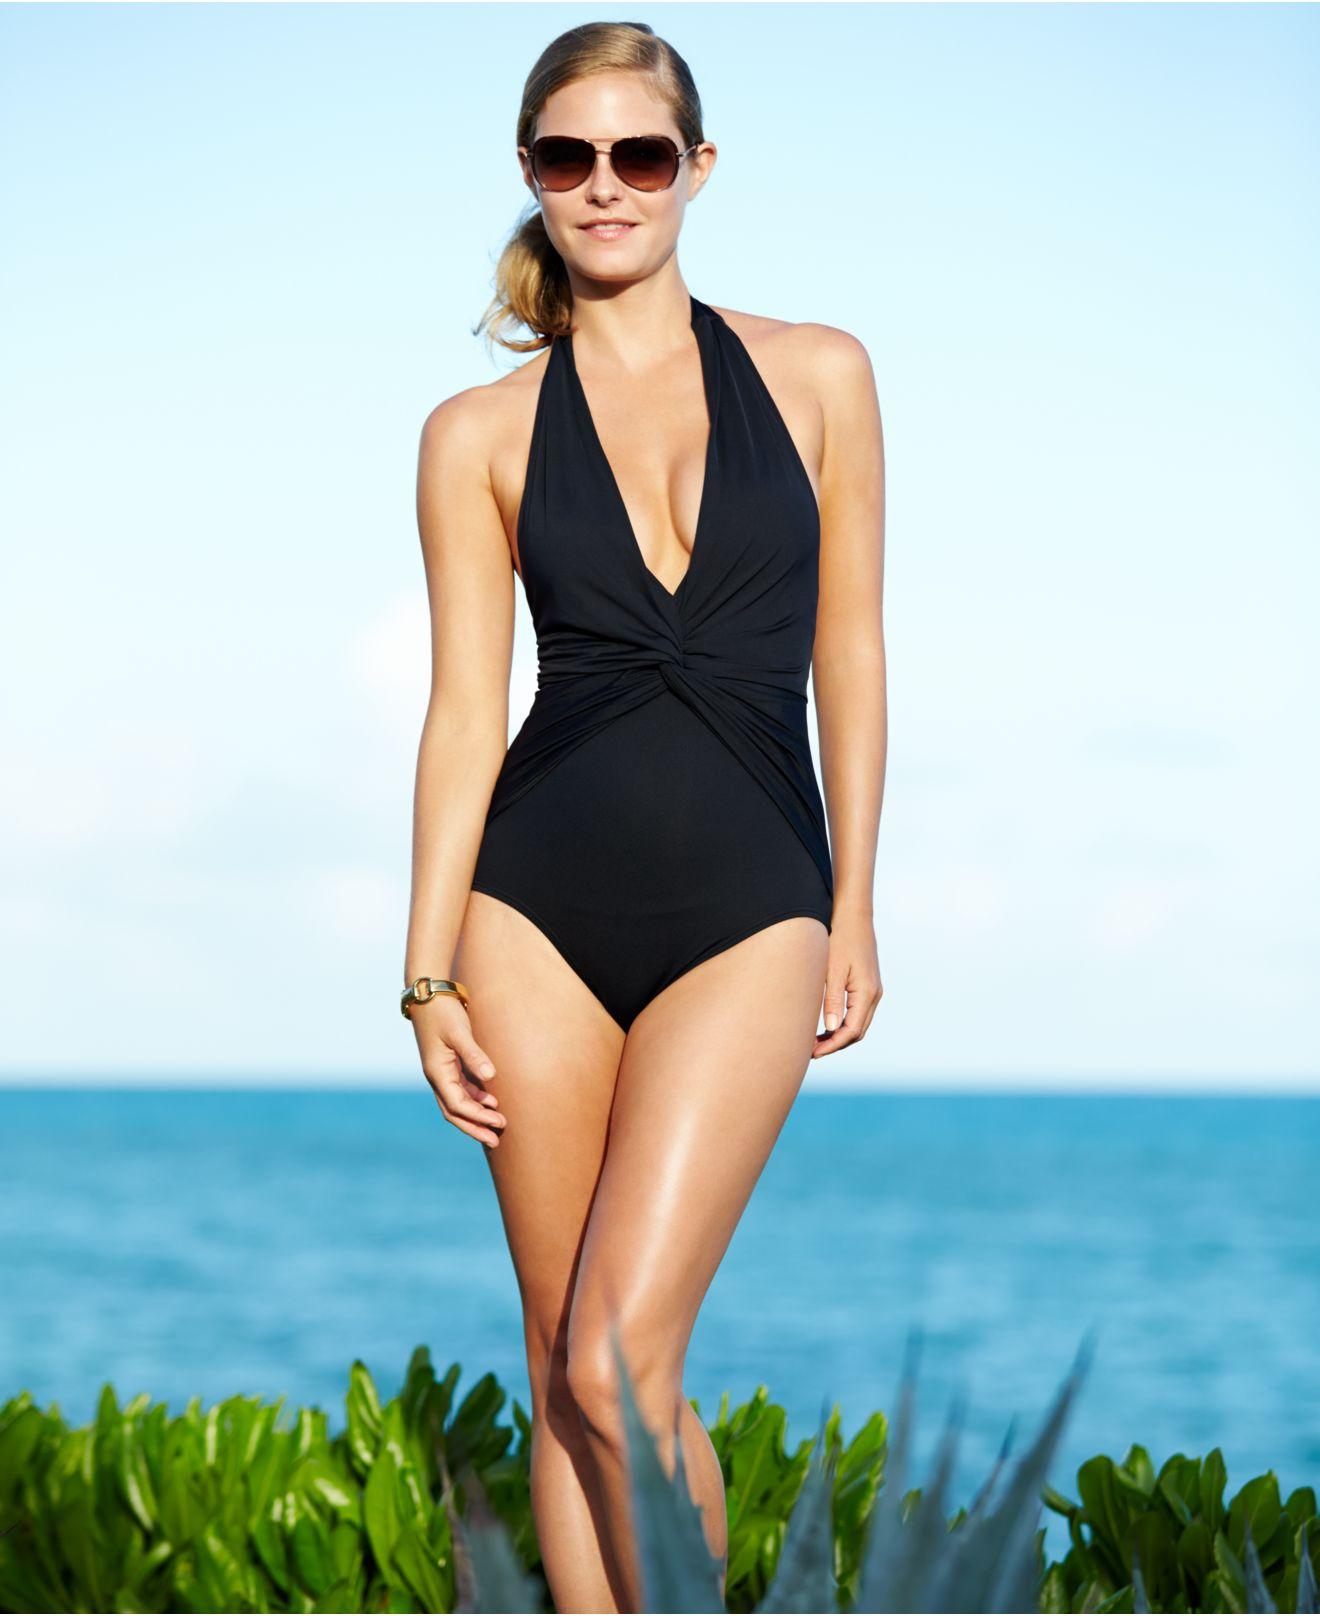 e76434c882bb2 Michael Kors Black One-Shoulder Choker One-Piece Swimsuit 14 NWOT.Michael  Michael Kors - Linked Solids One Shoulder Maillot Swimsuits One Piece.